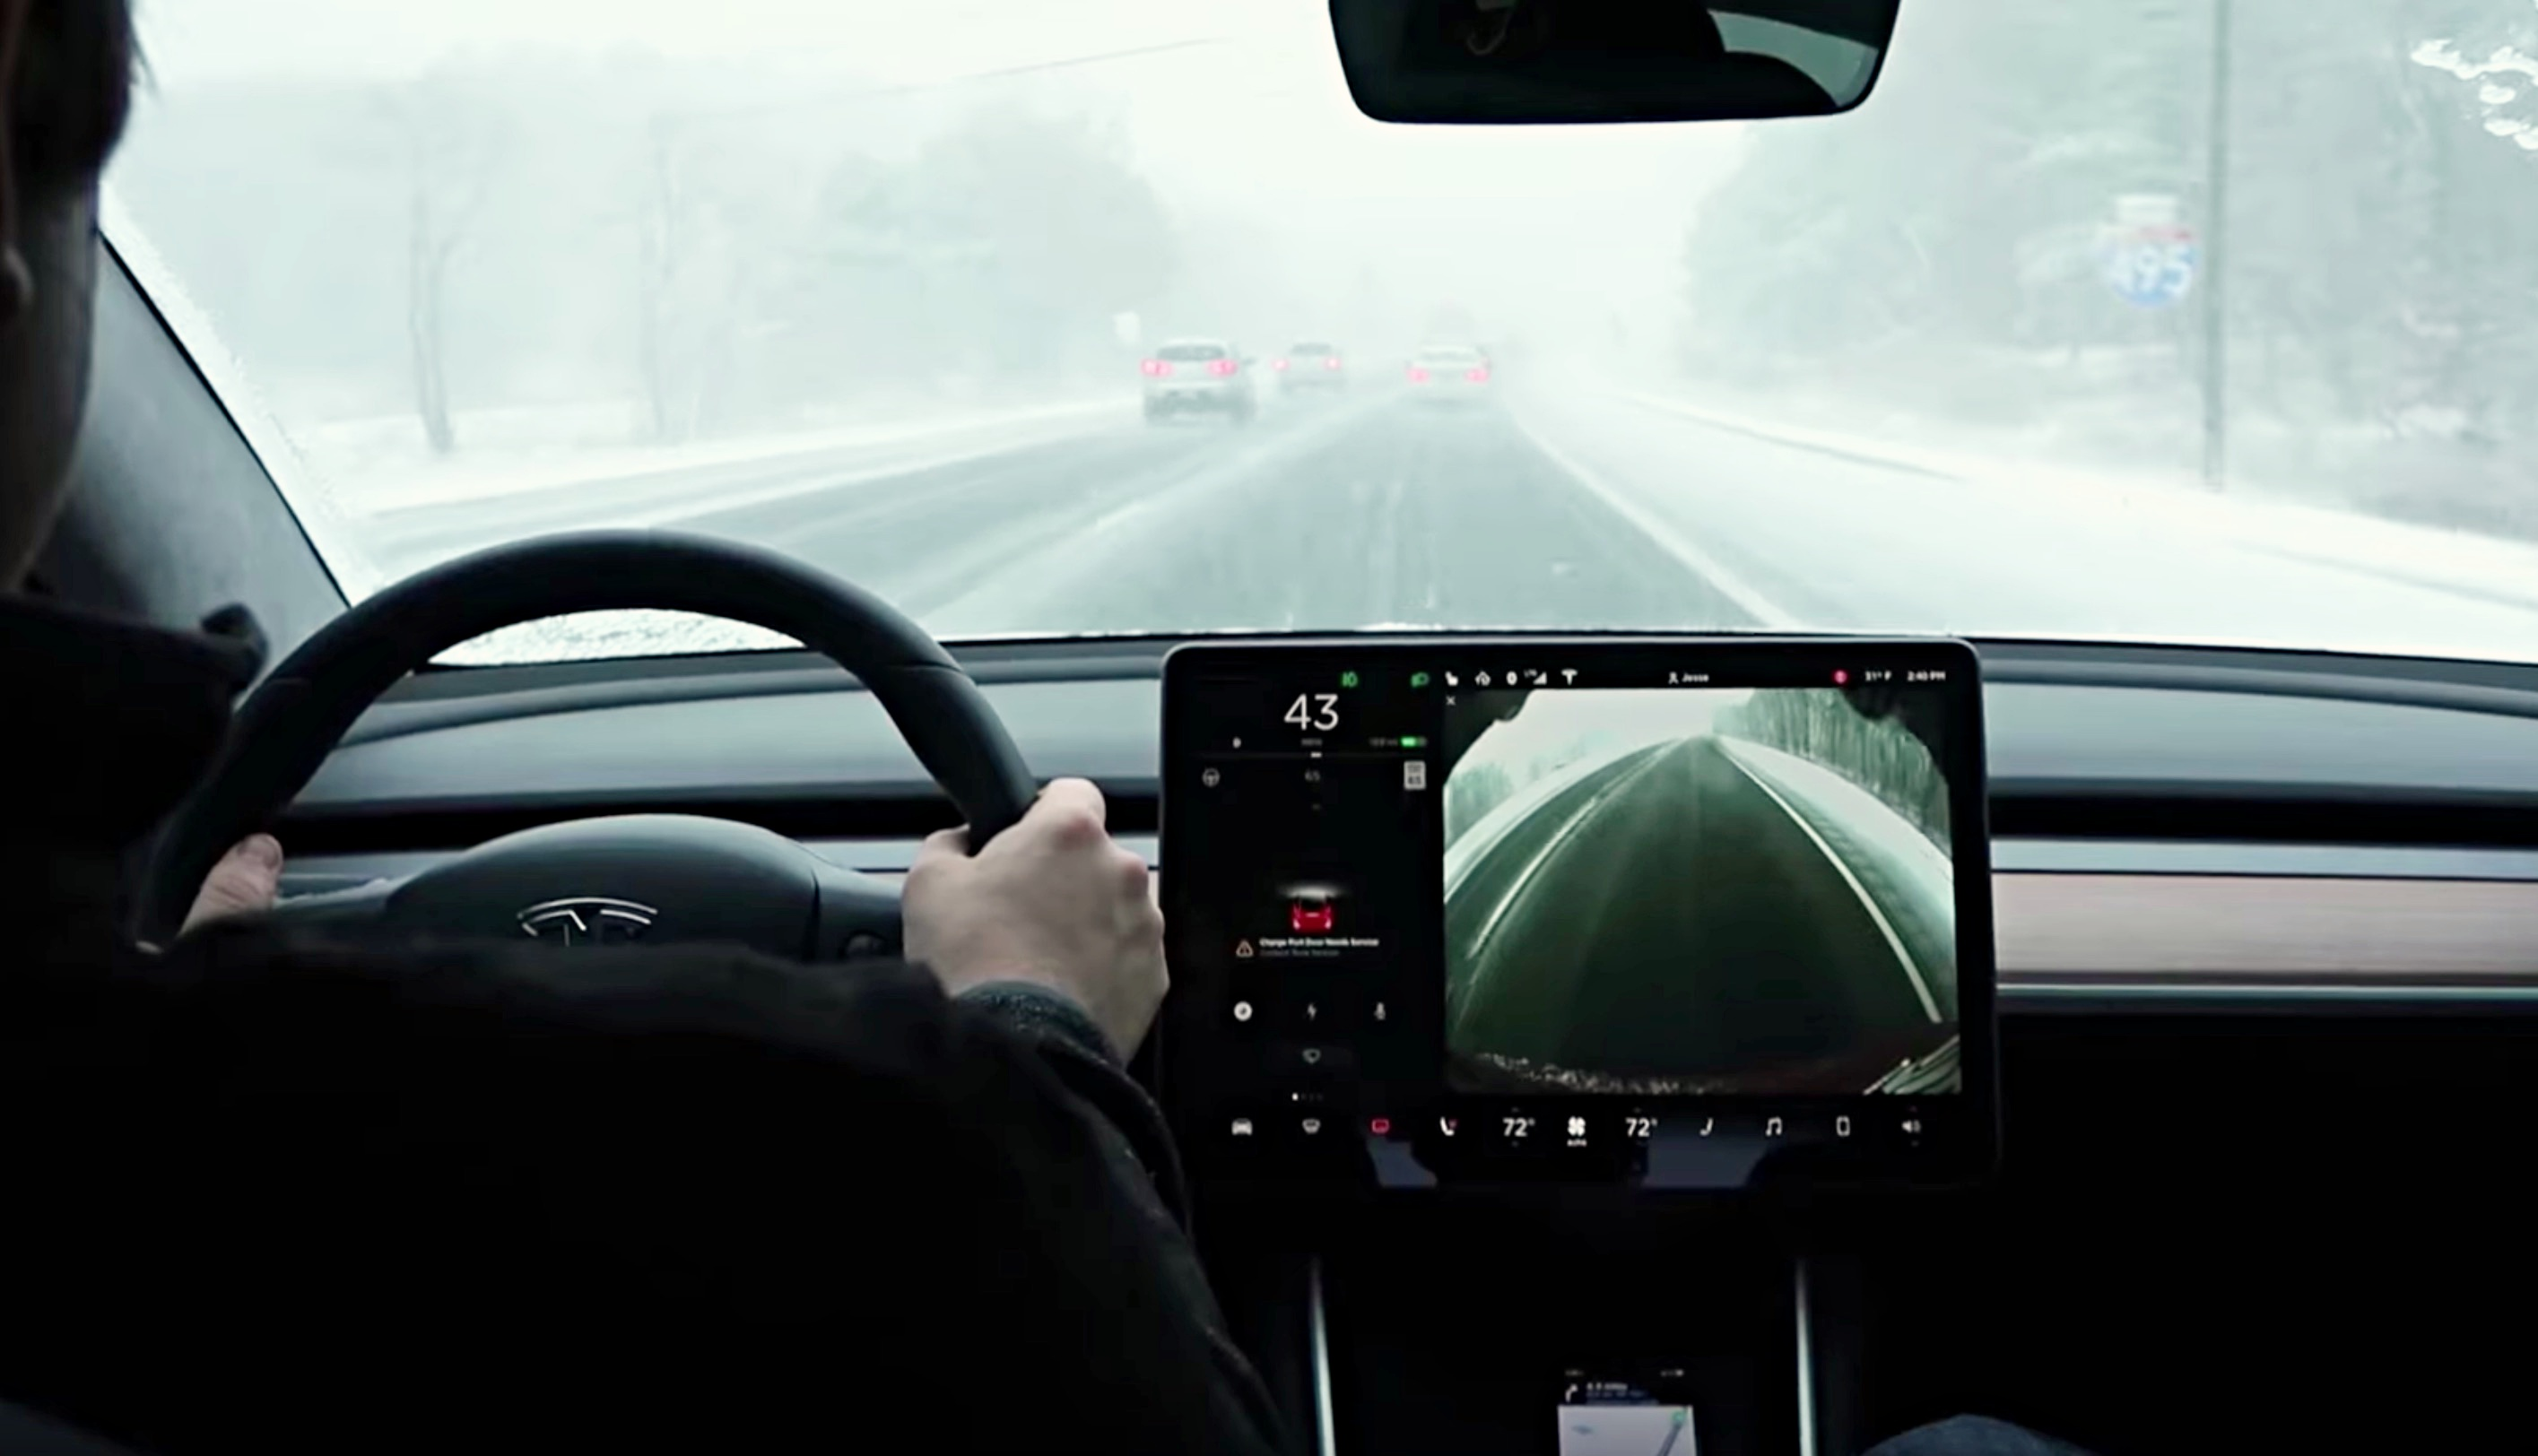 Best Look Yet At Tesla Model 3 Handling Snowy Conditions